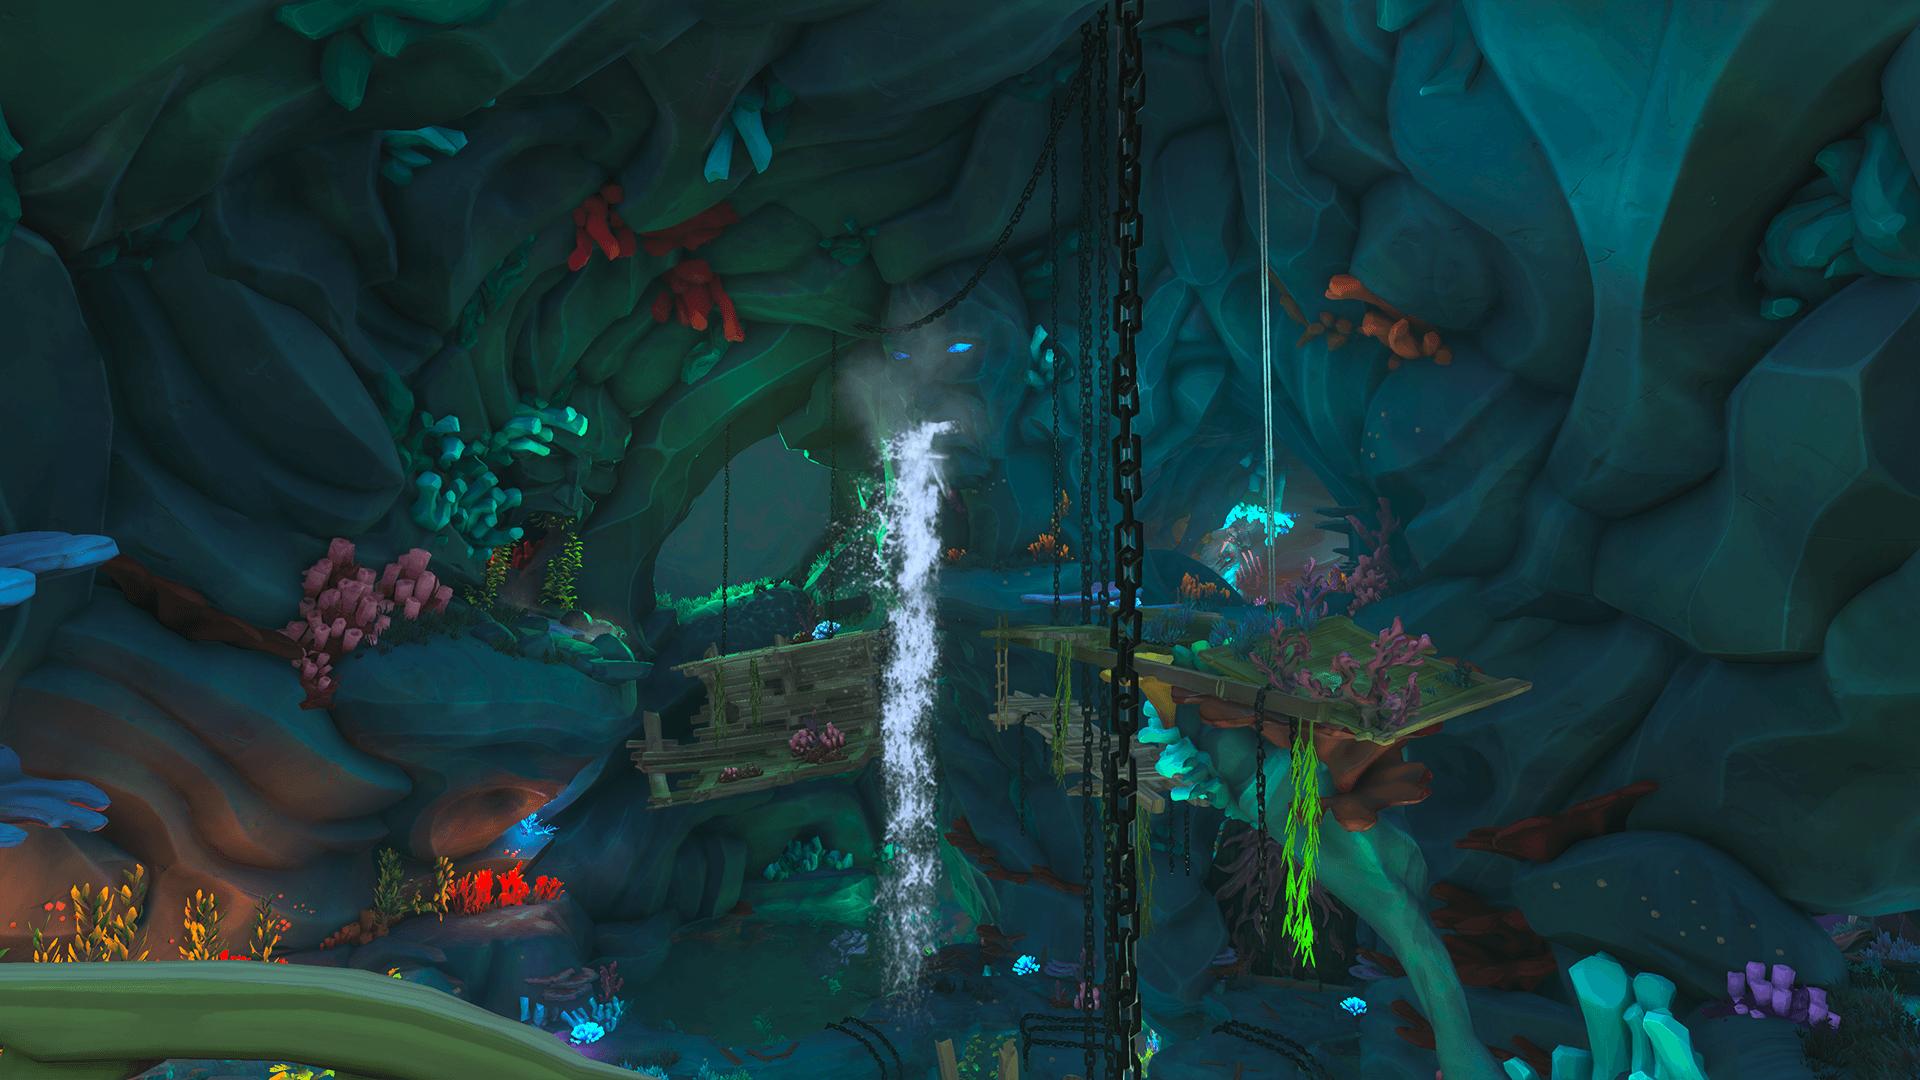 Citadel-Cavern 3-Water Filling Up